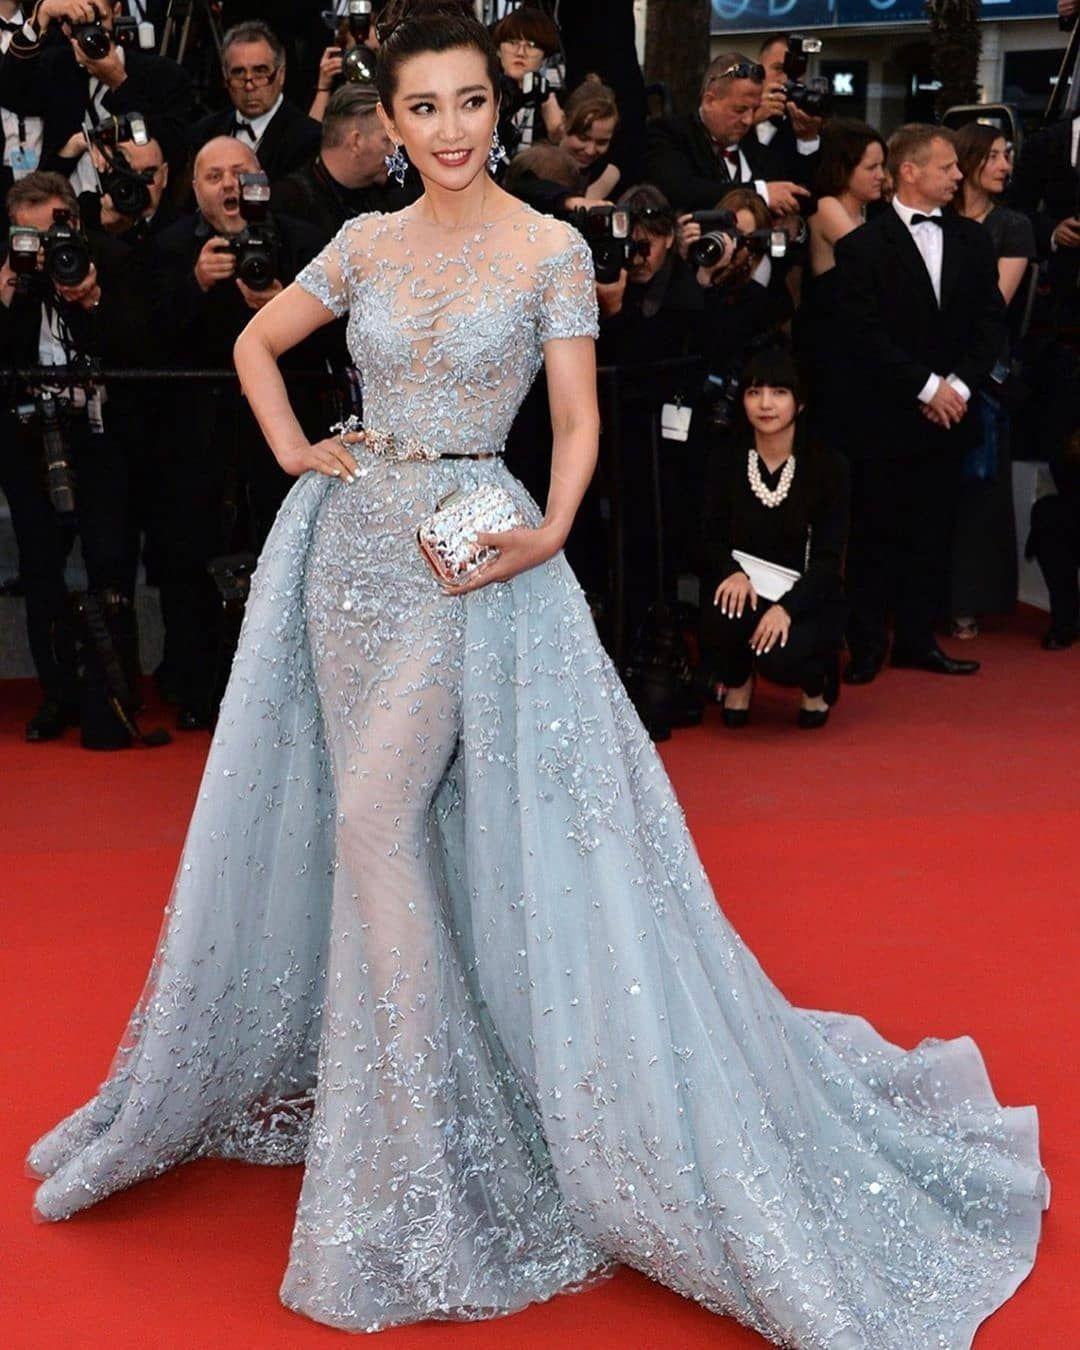 Blue Formal Dresses Ball Gowns Evening Wear And Wedding Designs Evening Dresses Ball Gowns Fancy Dresses